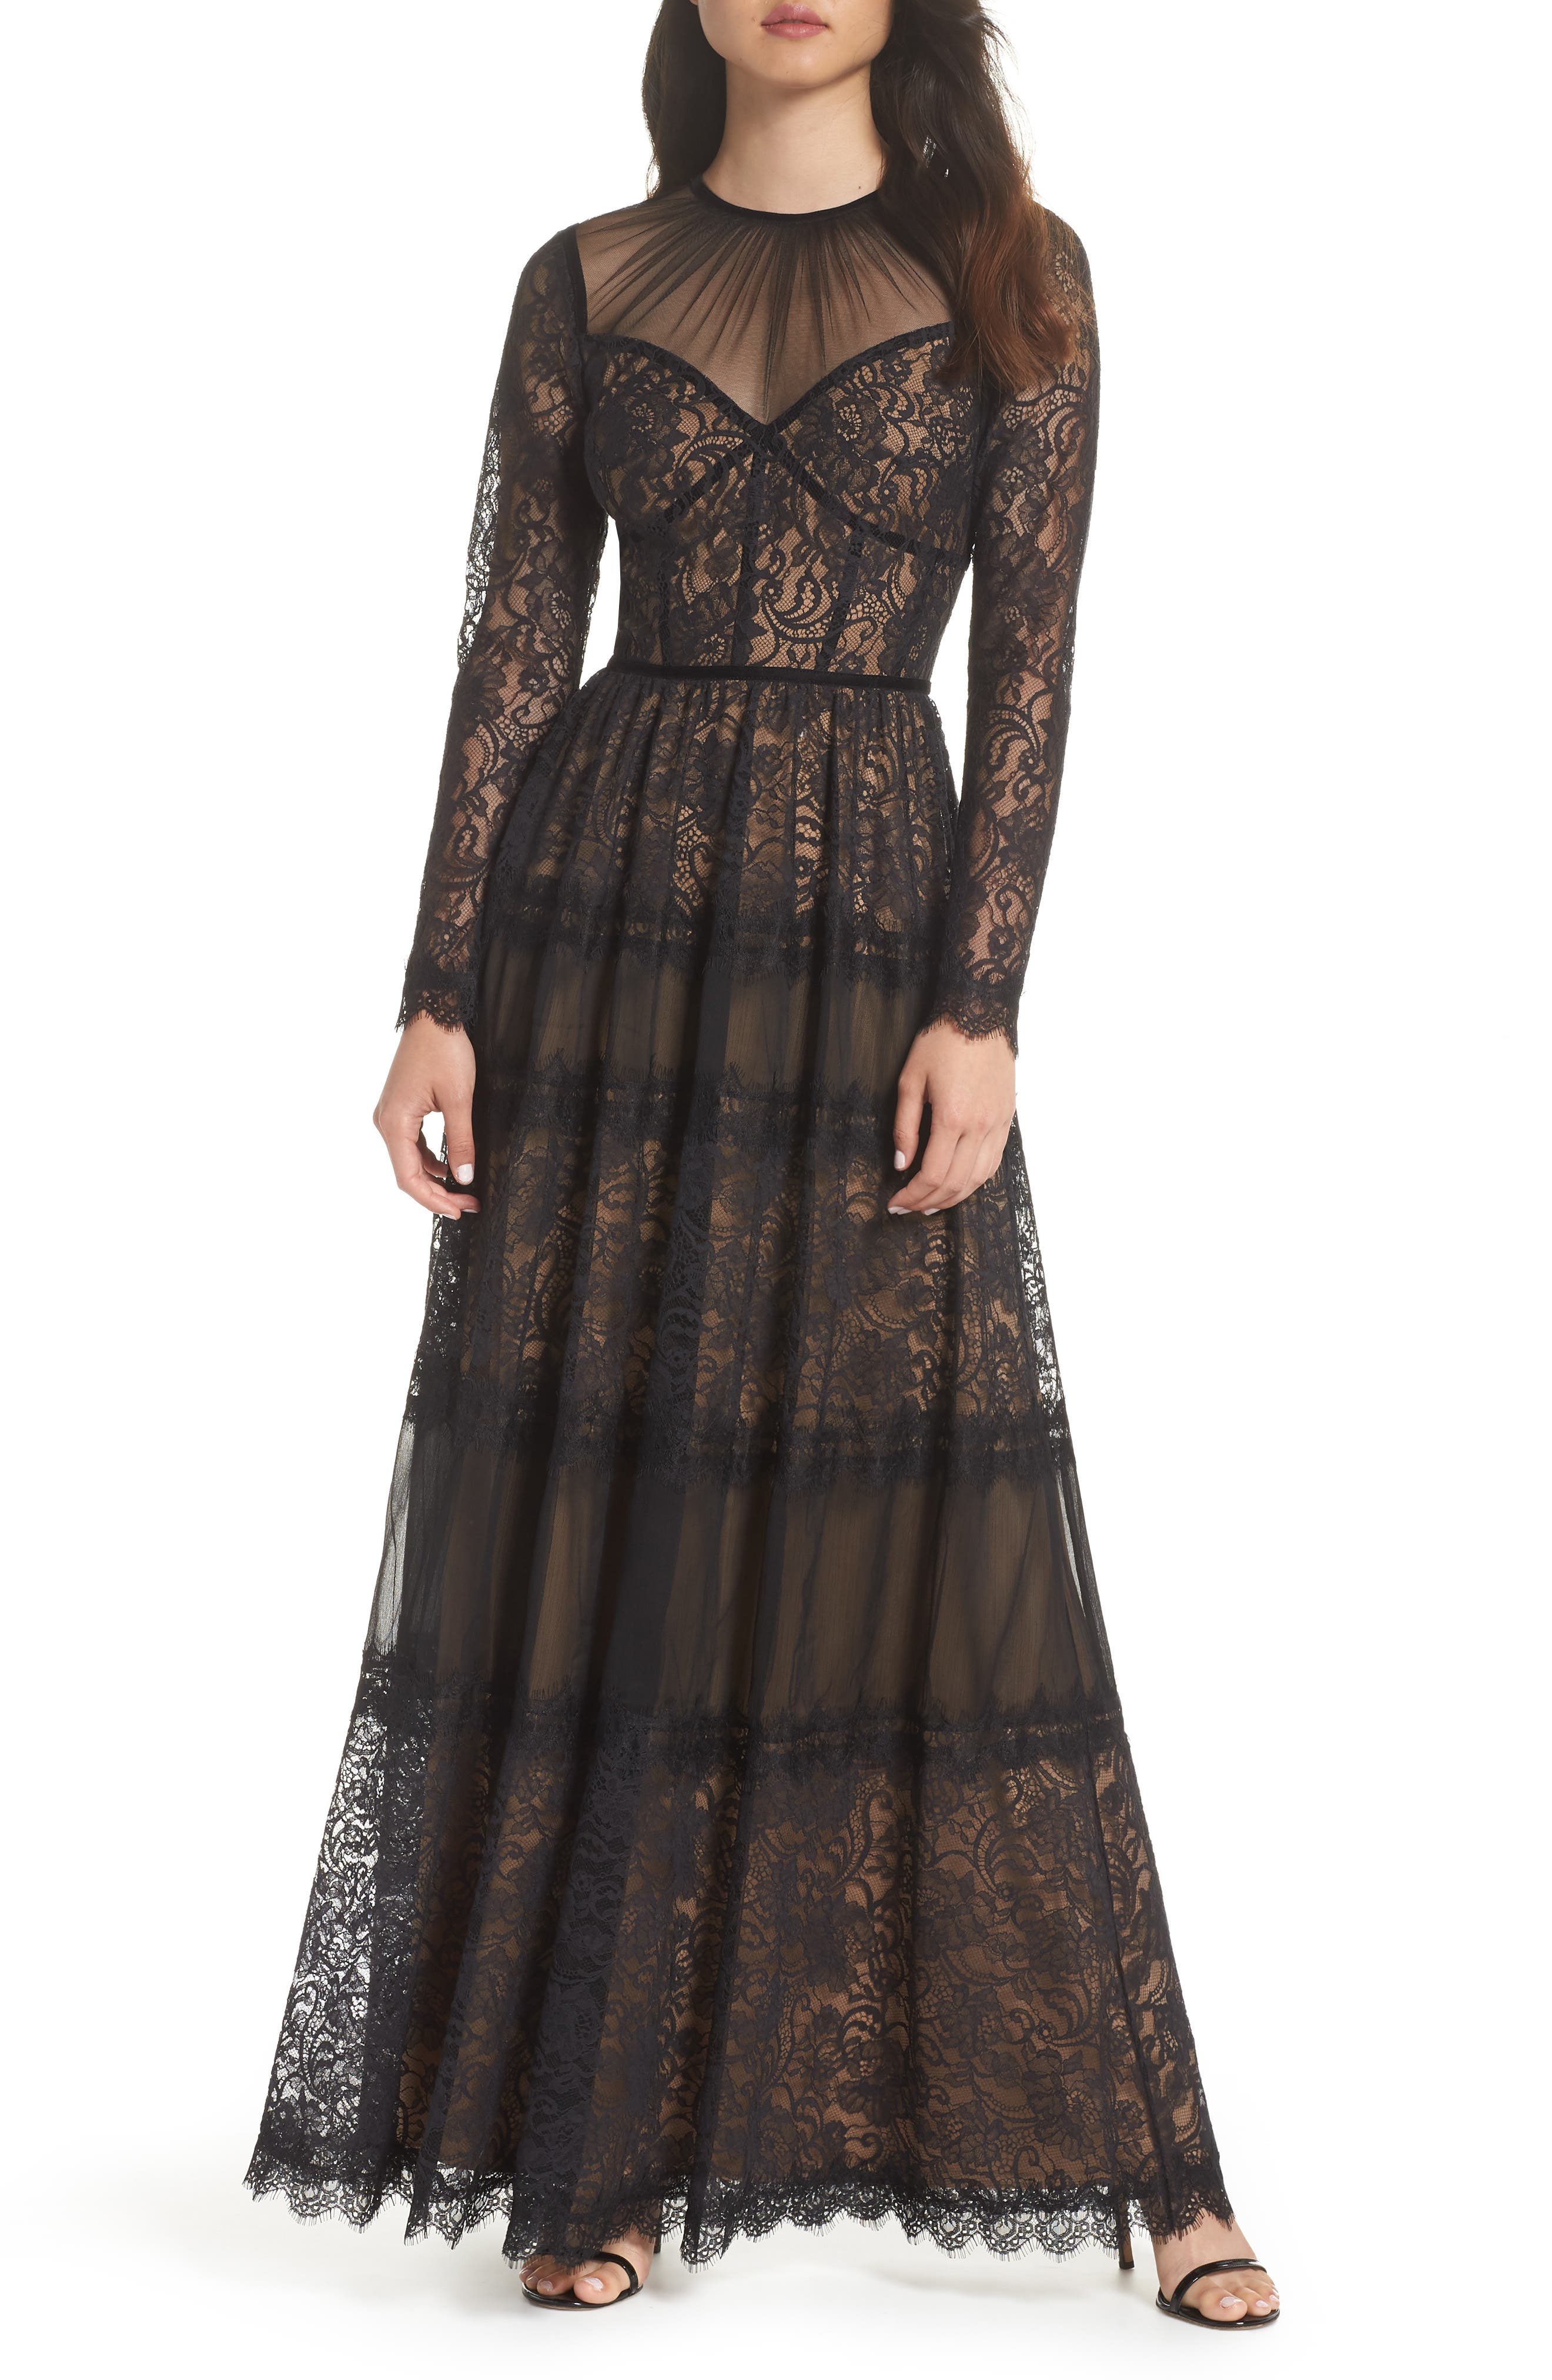 Victorian Dresses, Clothing: Patterns, Costumes, Custom Dresses Womens Tadashi Shoji Lace Gown $688.00 AT vintagedancer.com